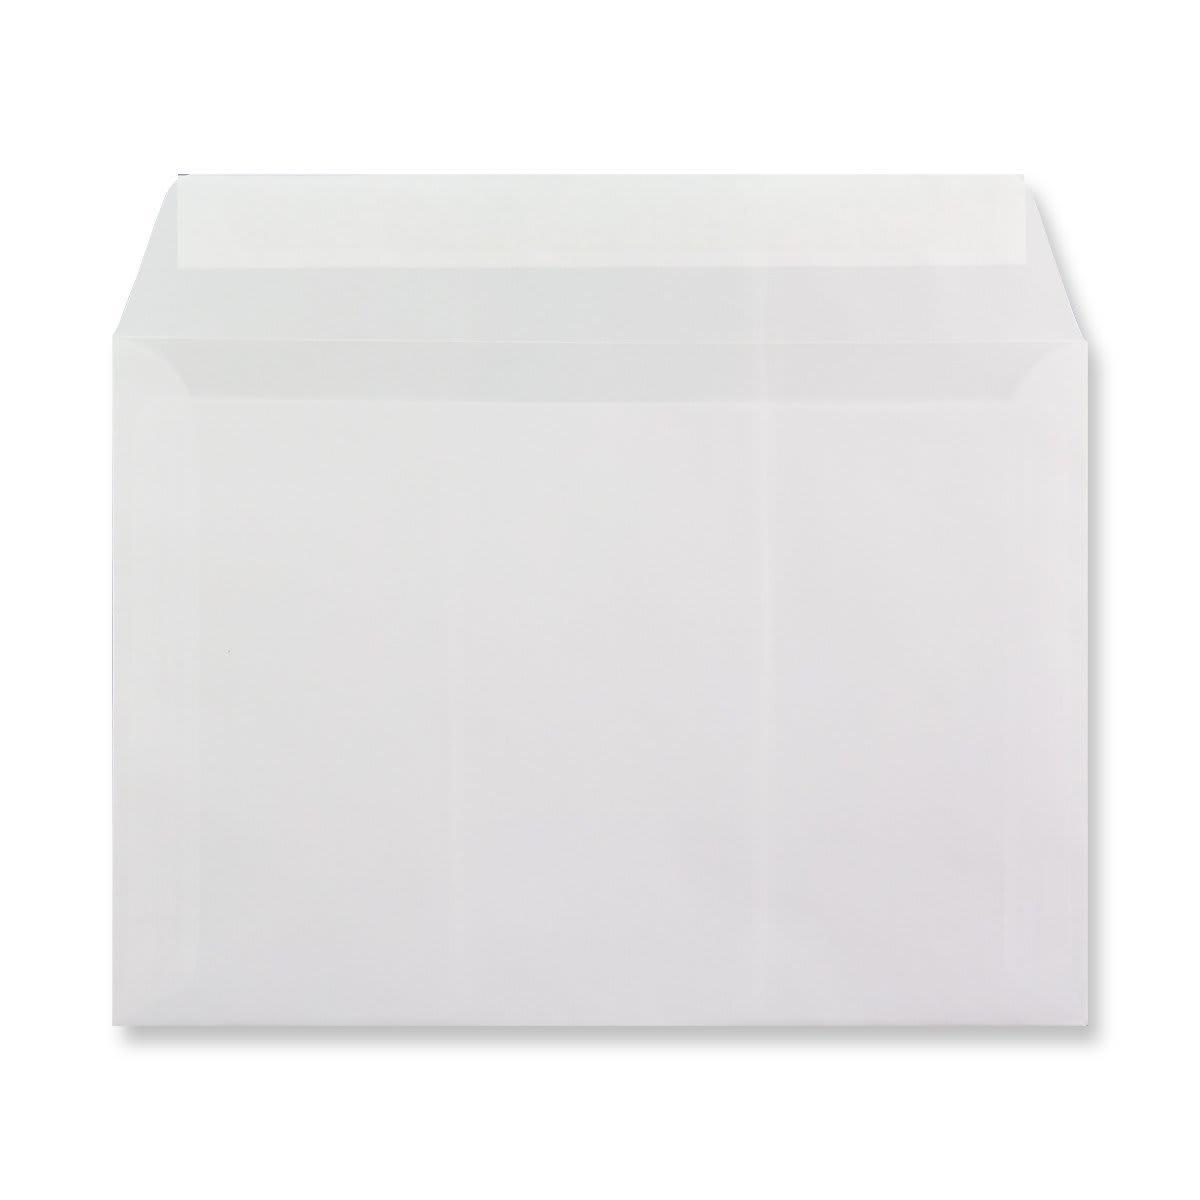 C5 WHITE TRANSLUCENT ENVELOPES